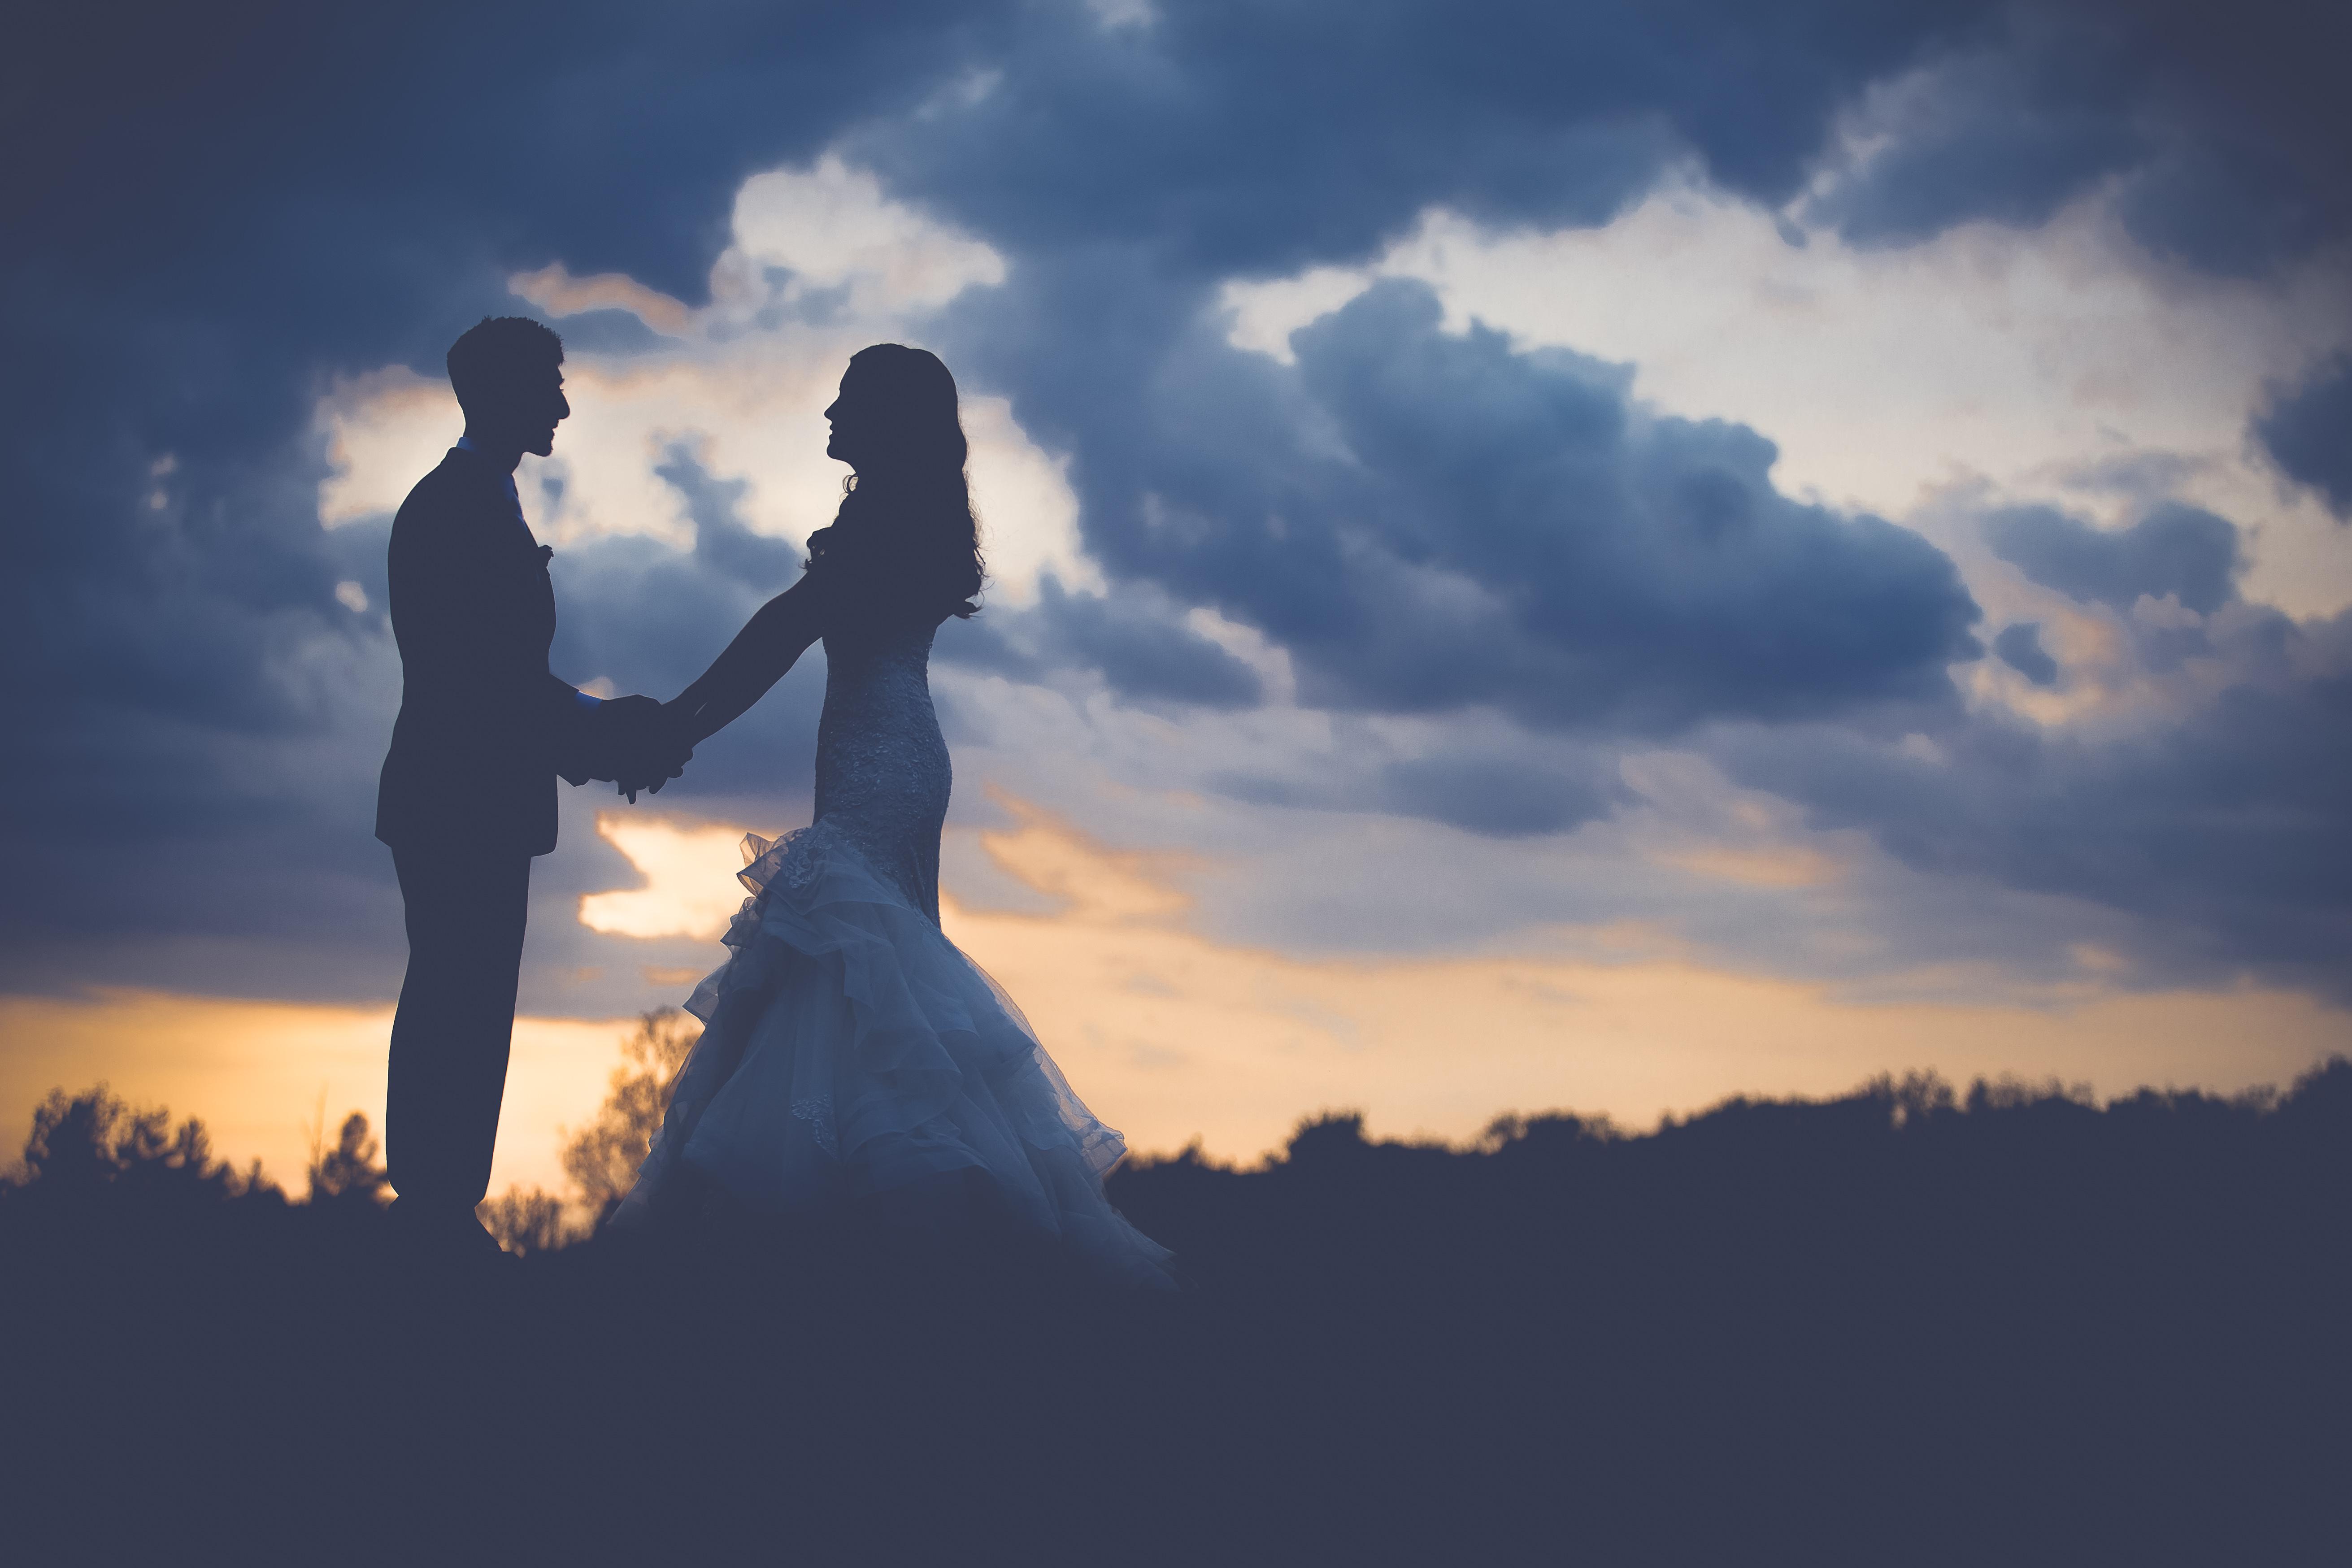 Man Horizon Silhouette Cloud People Sky Sunrise Sunset Sunlight Morning Dawn Dusk Love Romance Together